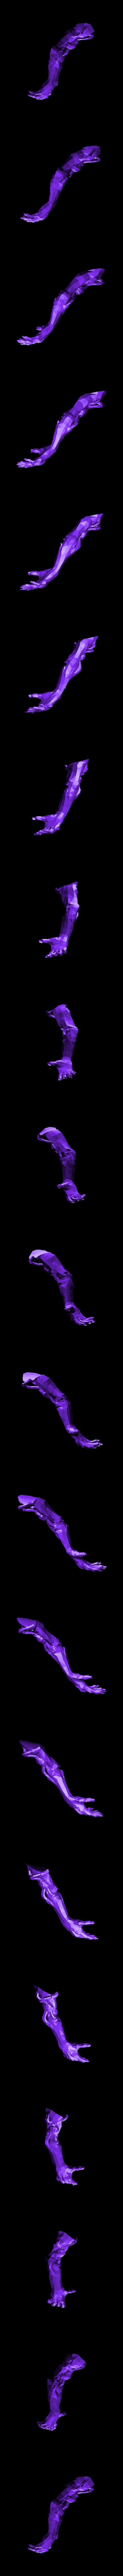 revenant_ArmR.stl Download free STL file Revenant posed (Doom) • 3D printable object, Animalgel